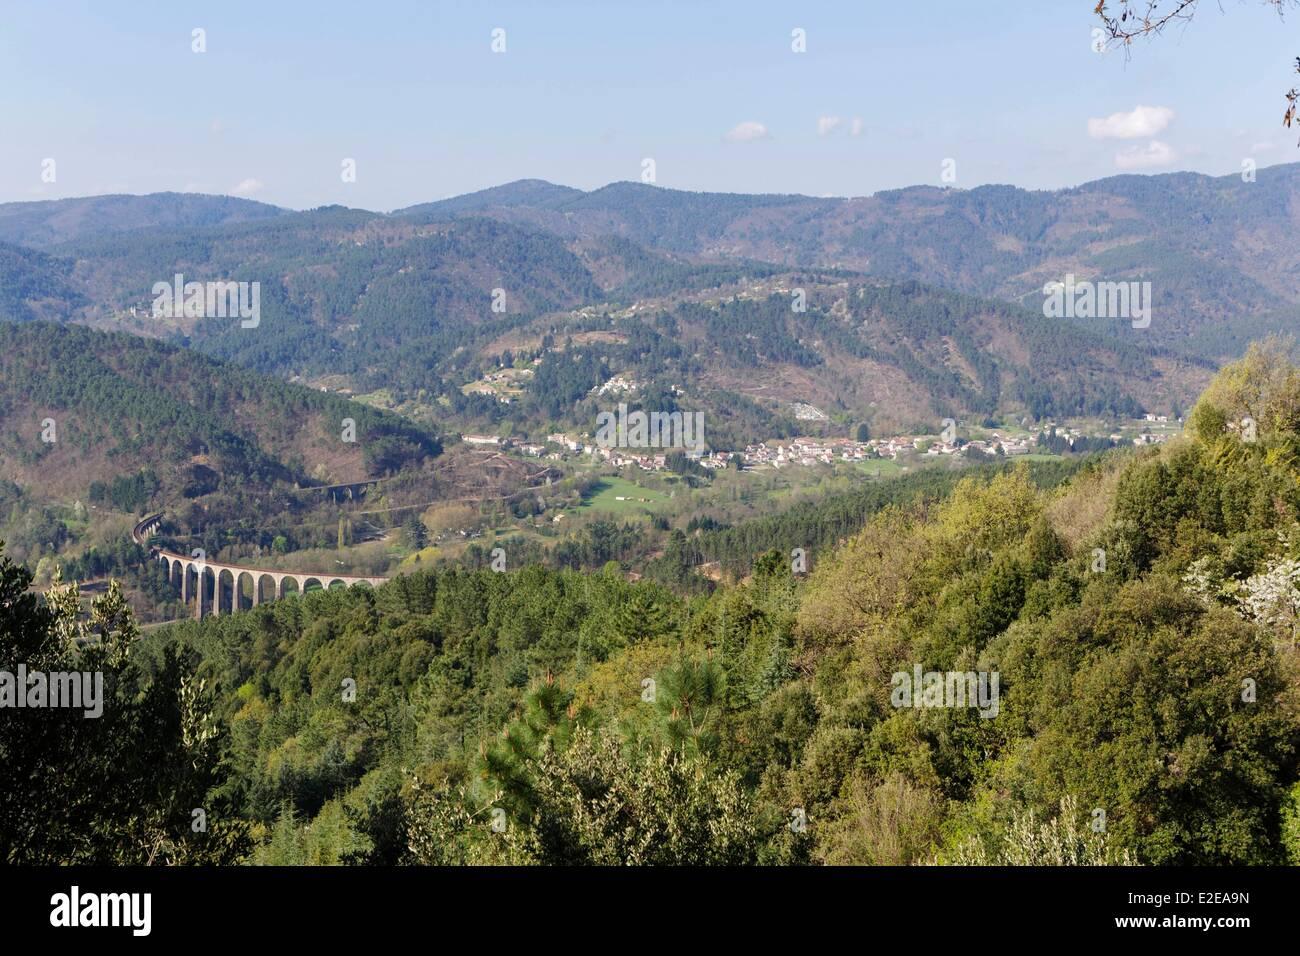 France, Gard, the railway line Vern to Cevennes, around Genolhac - Stock Image